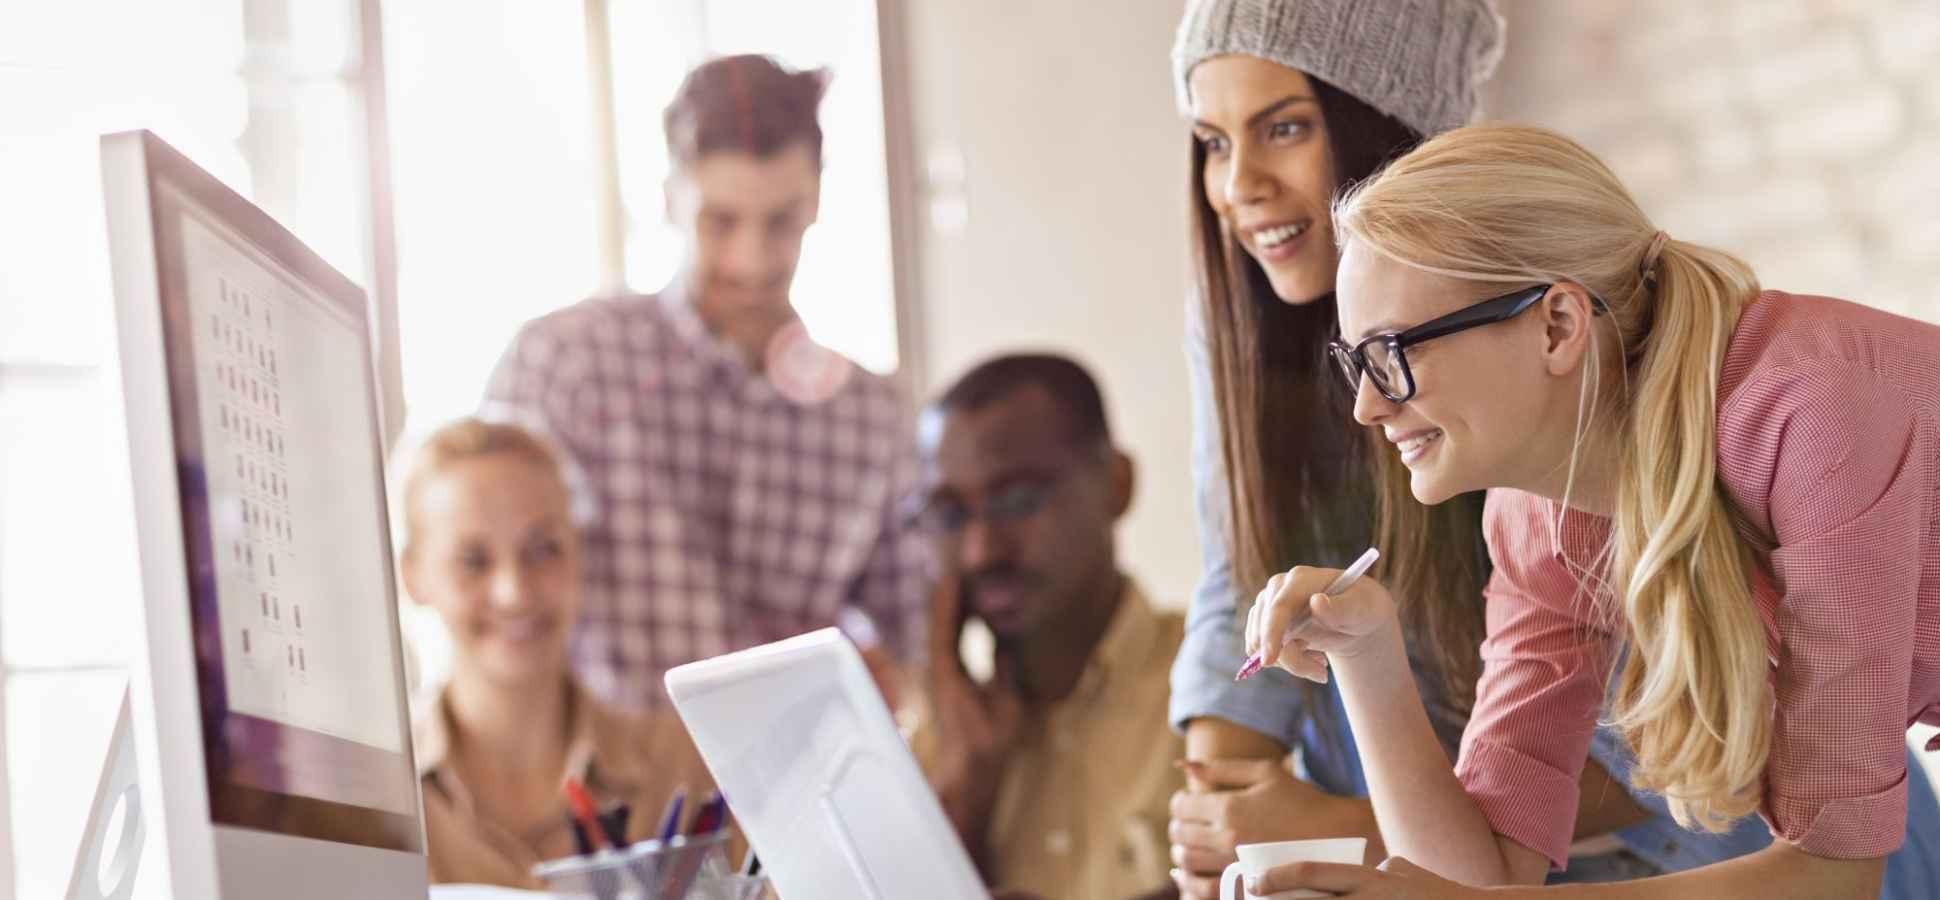 4 Fastest-Growing Hotspots for Women Entrepreneurs